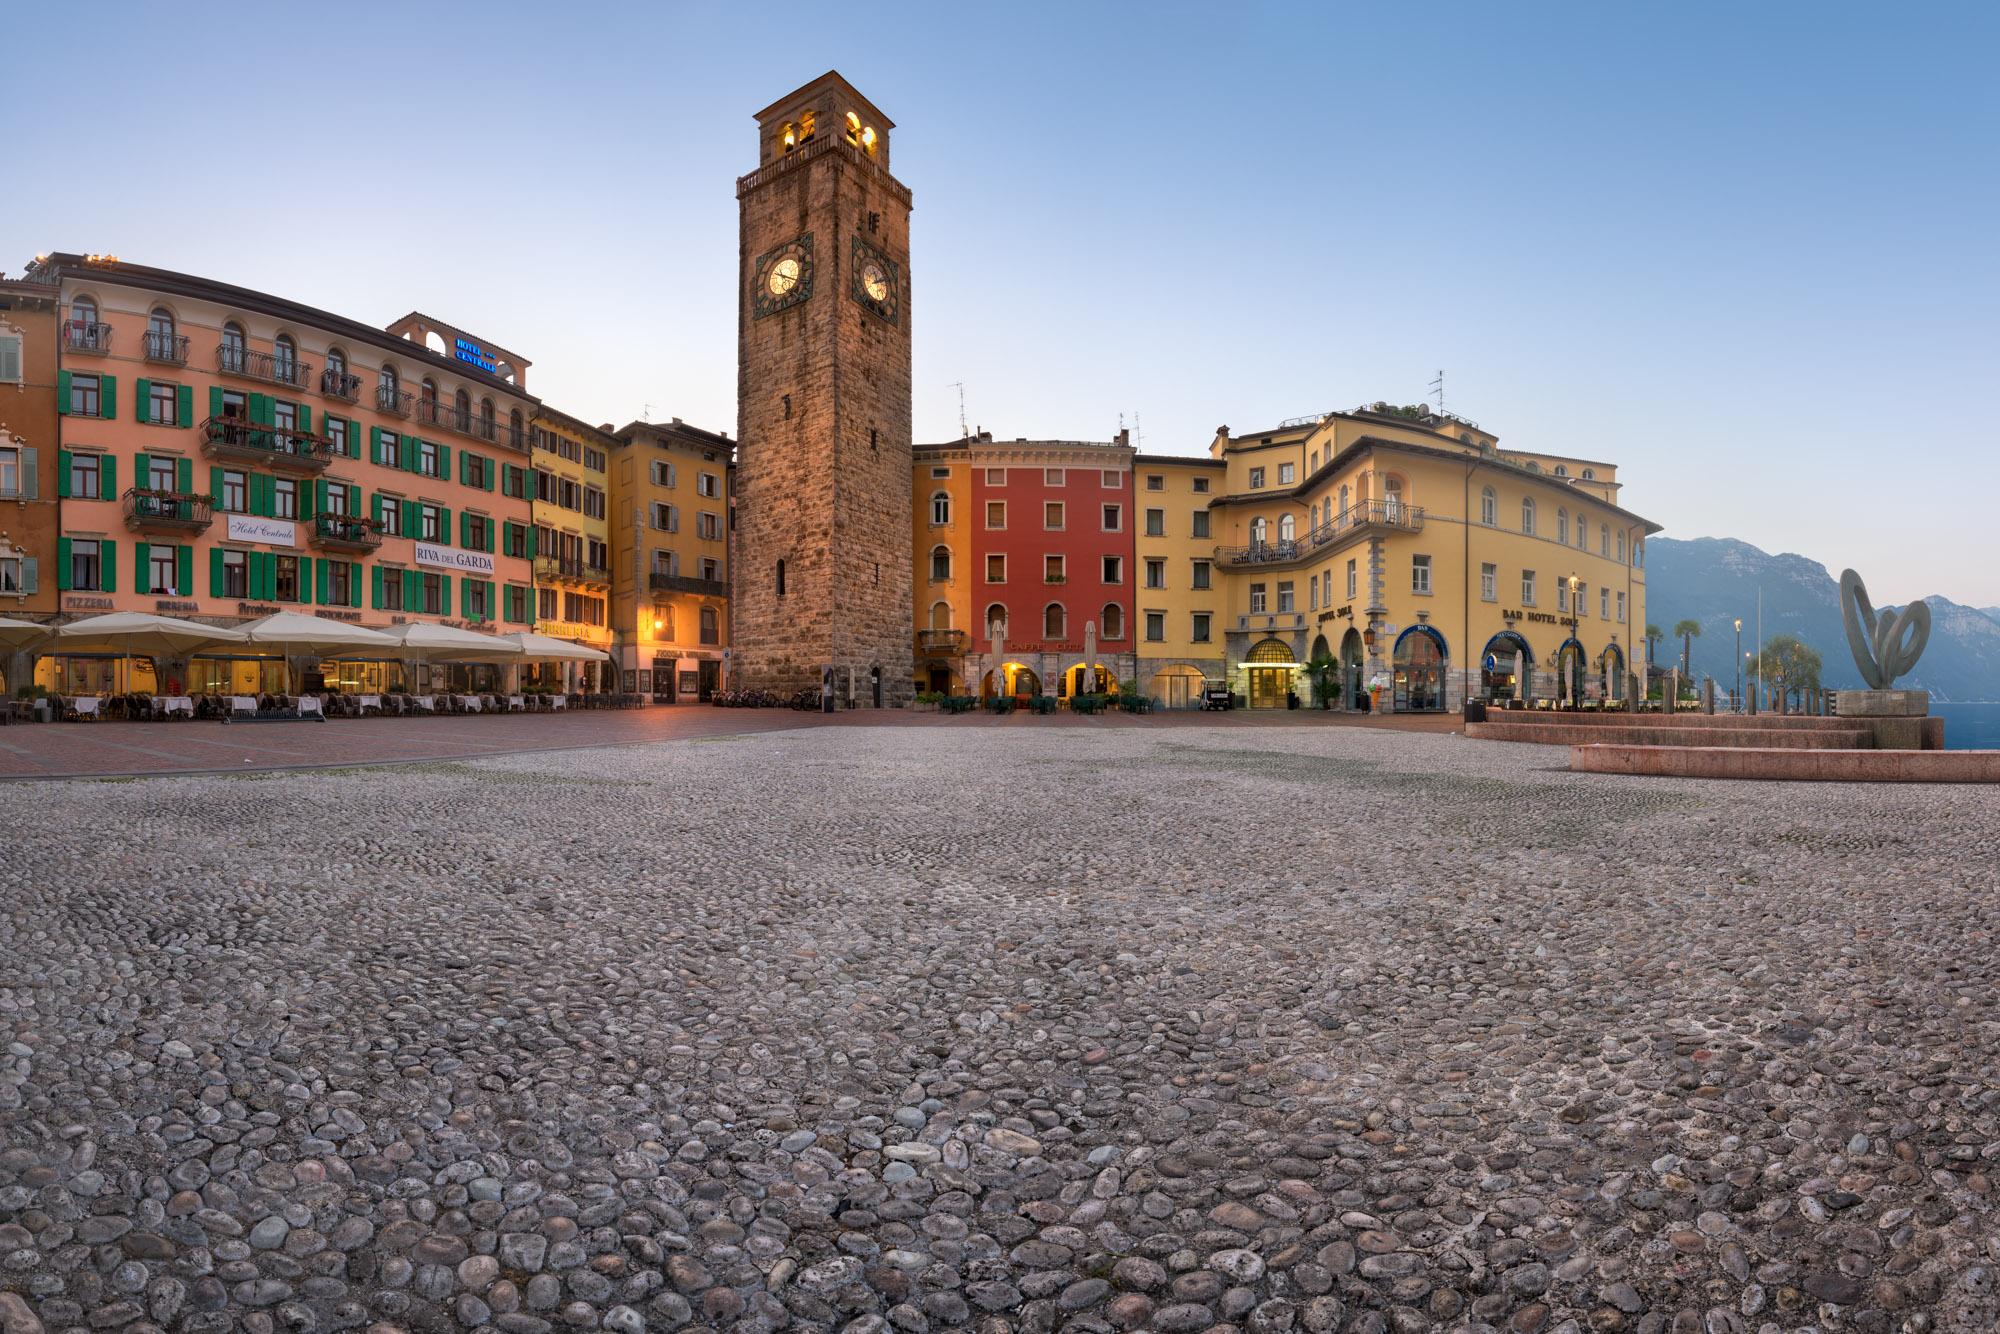 Piazza III November and Aponale Tower, Riva del Garda, Italy